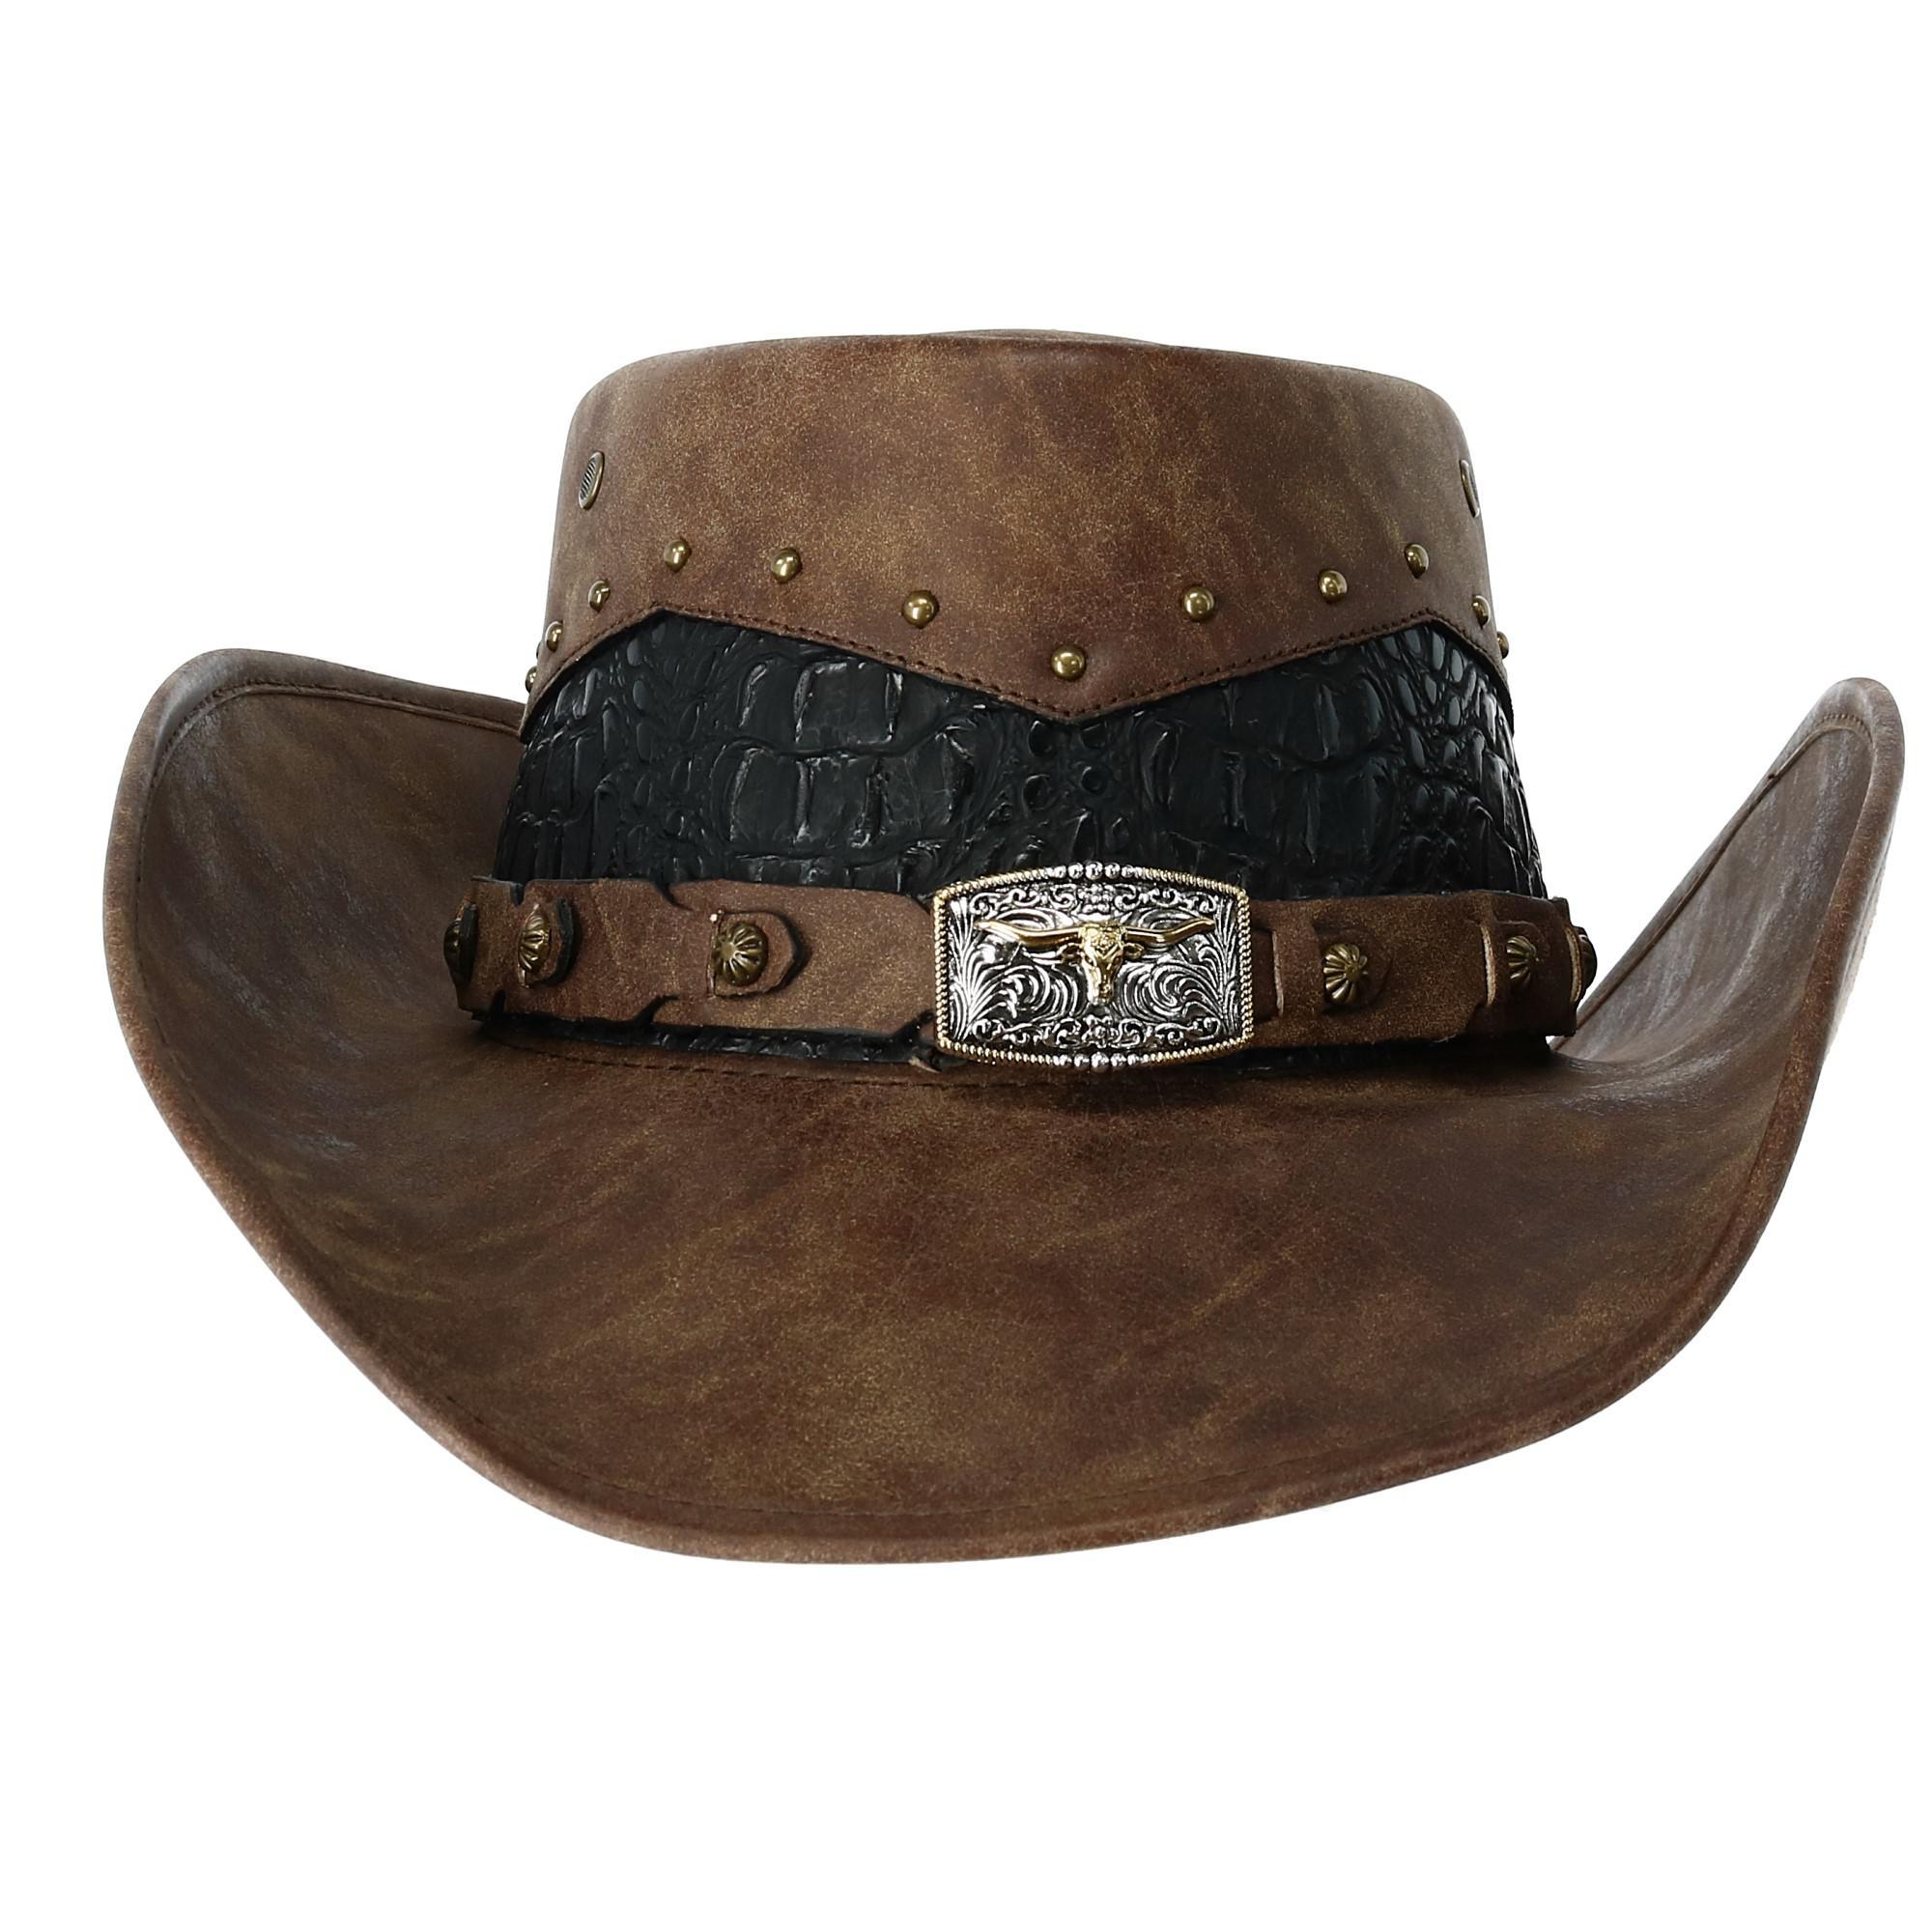 Kenny K Men's Faux Leather Western Hat with Medallion Detailed Crown - image 4 de 5